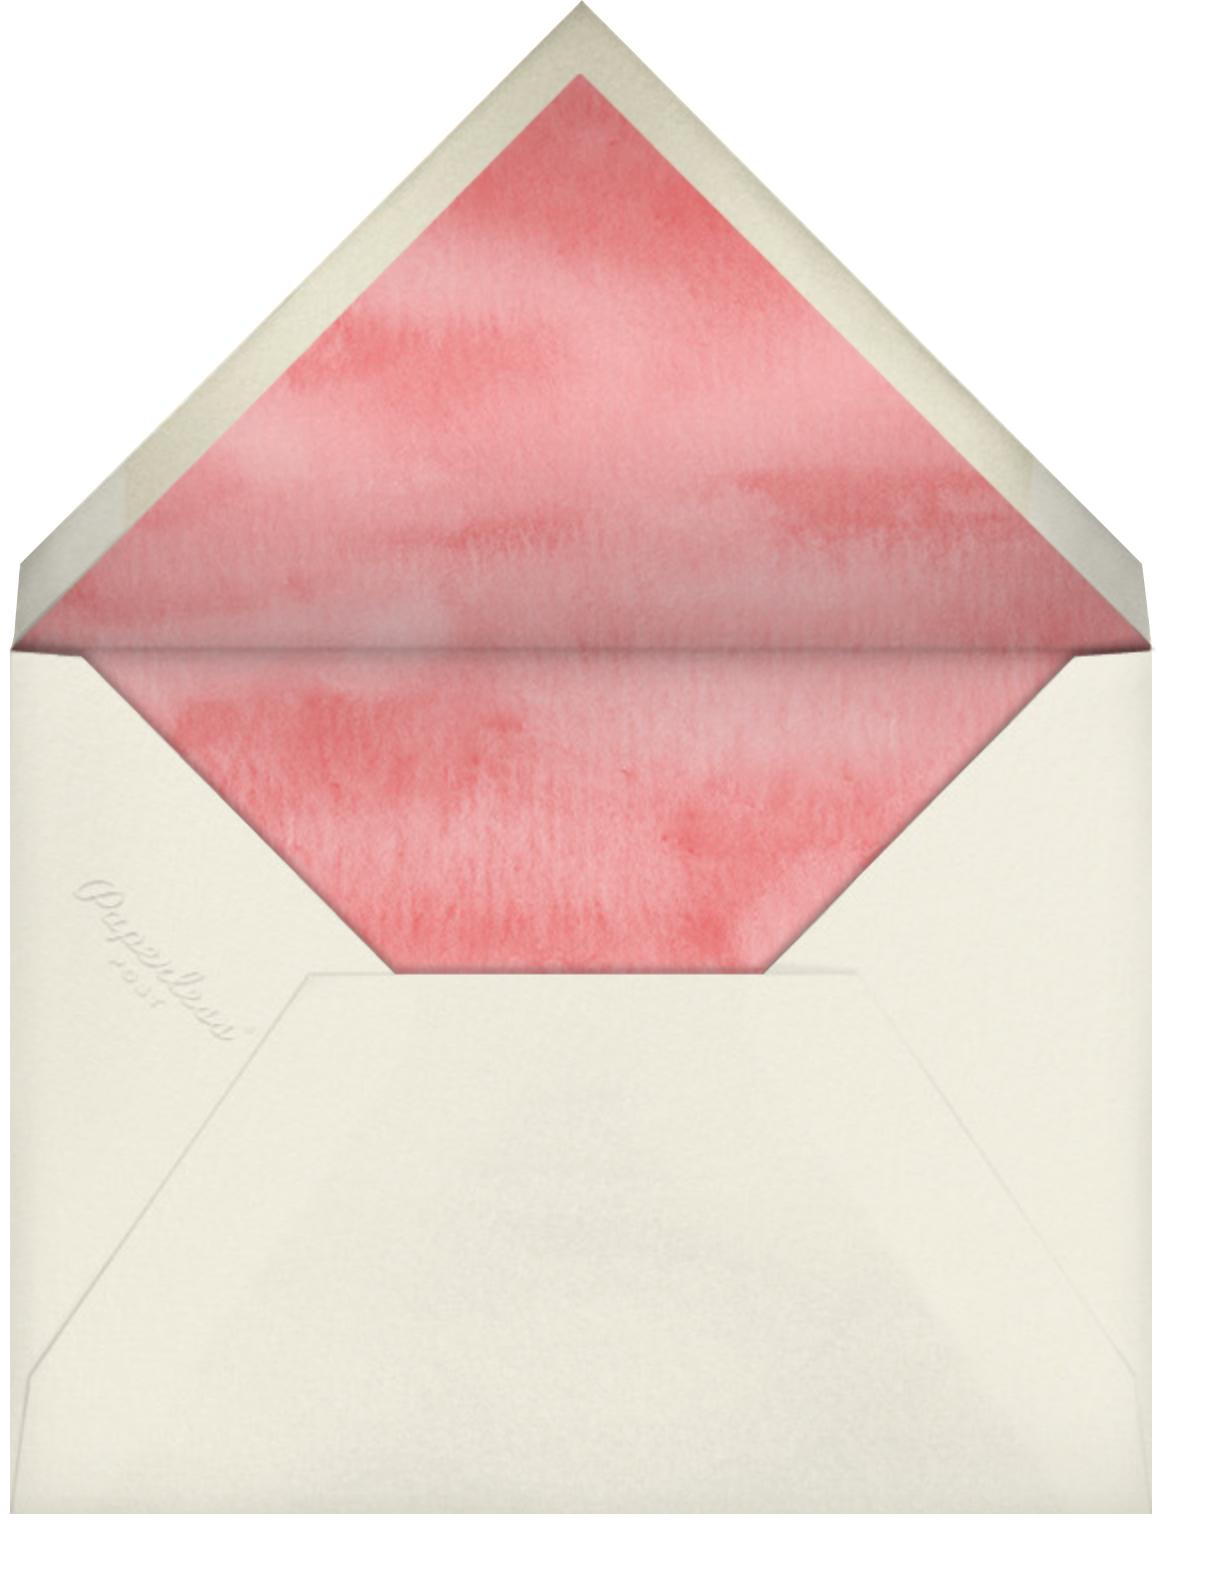 Kir Royale - Felix Doolittle - Engagement party - envelope back